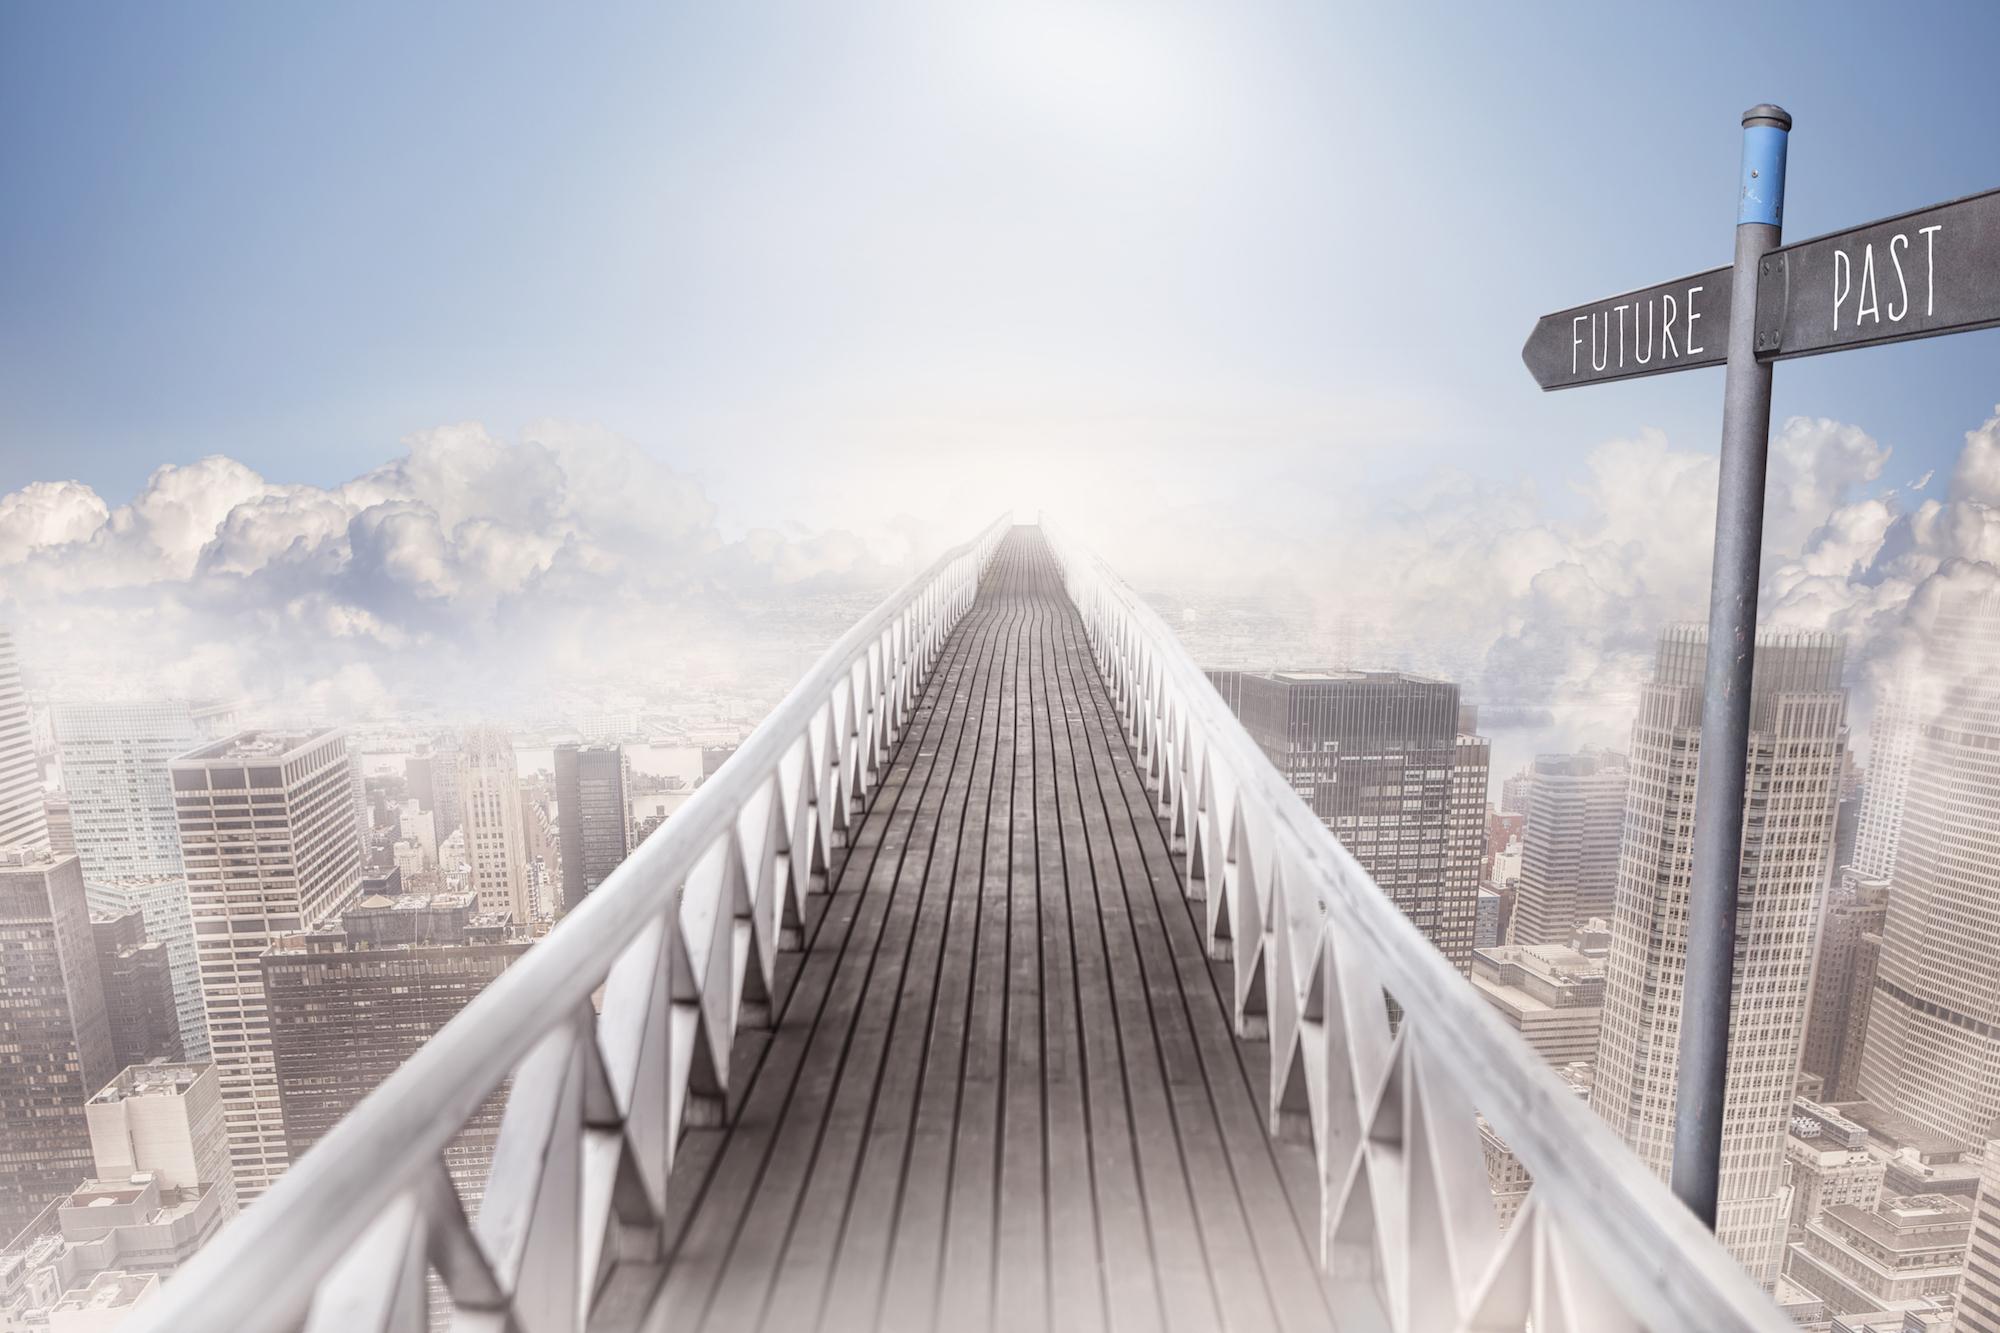 bridge-to-future